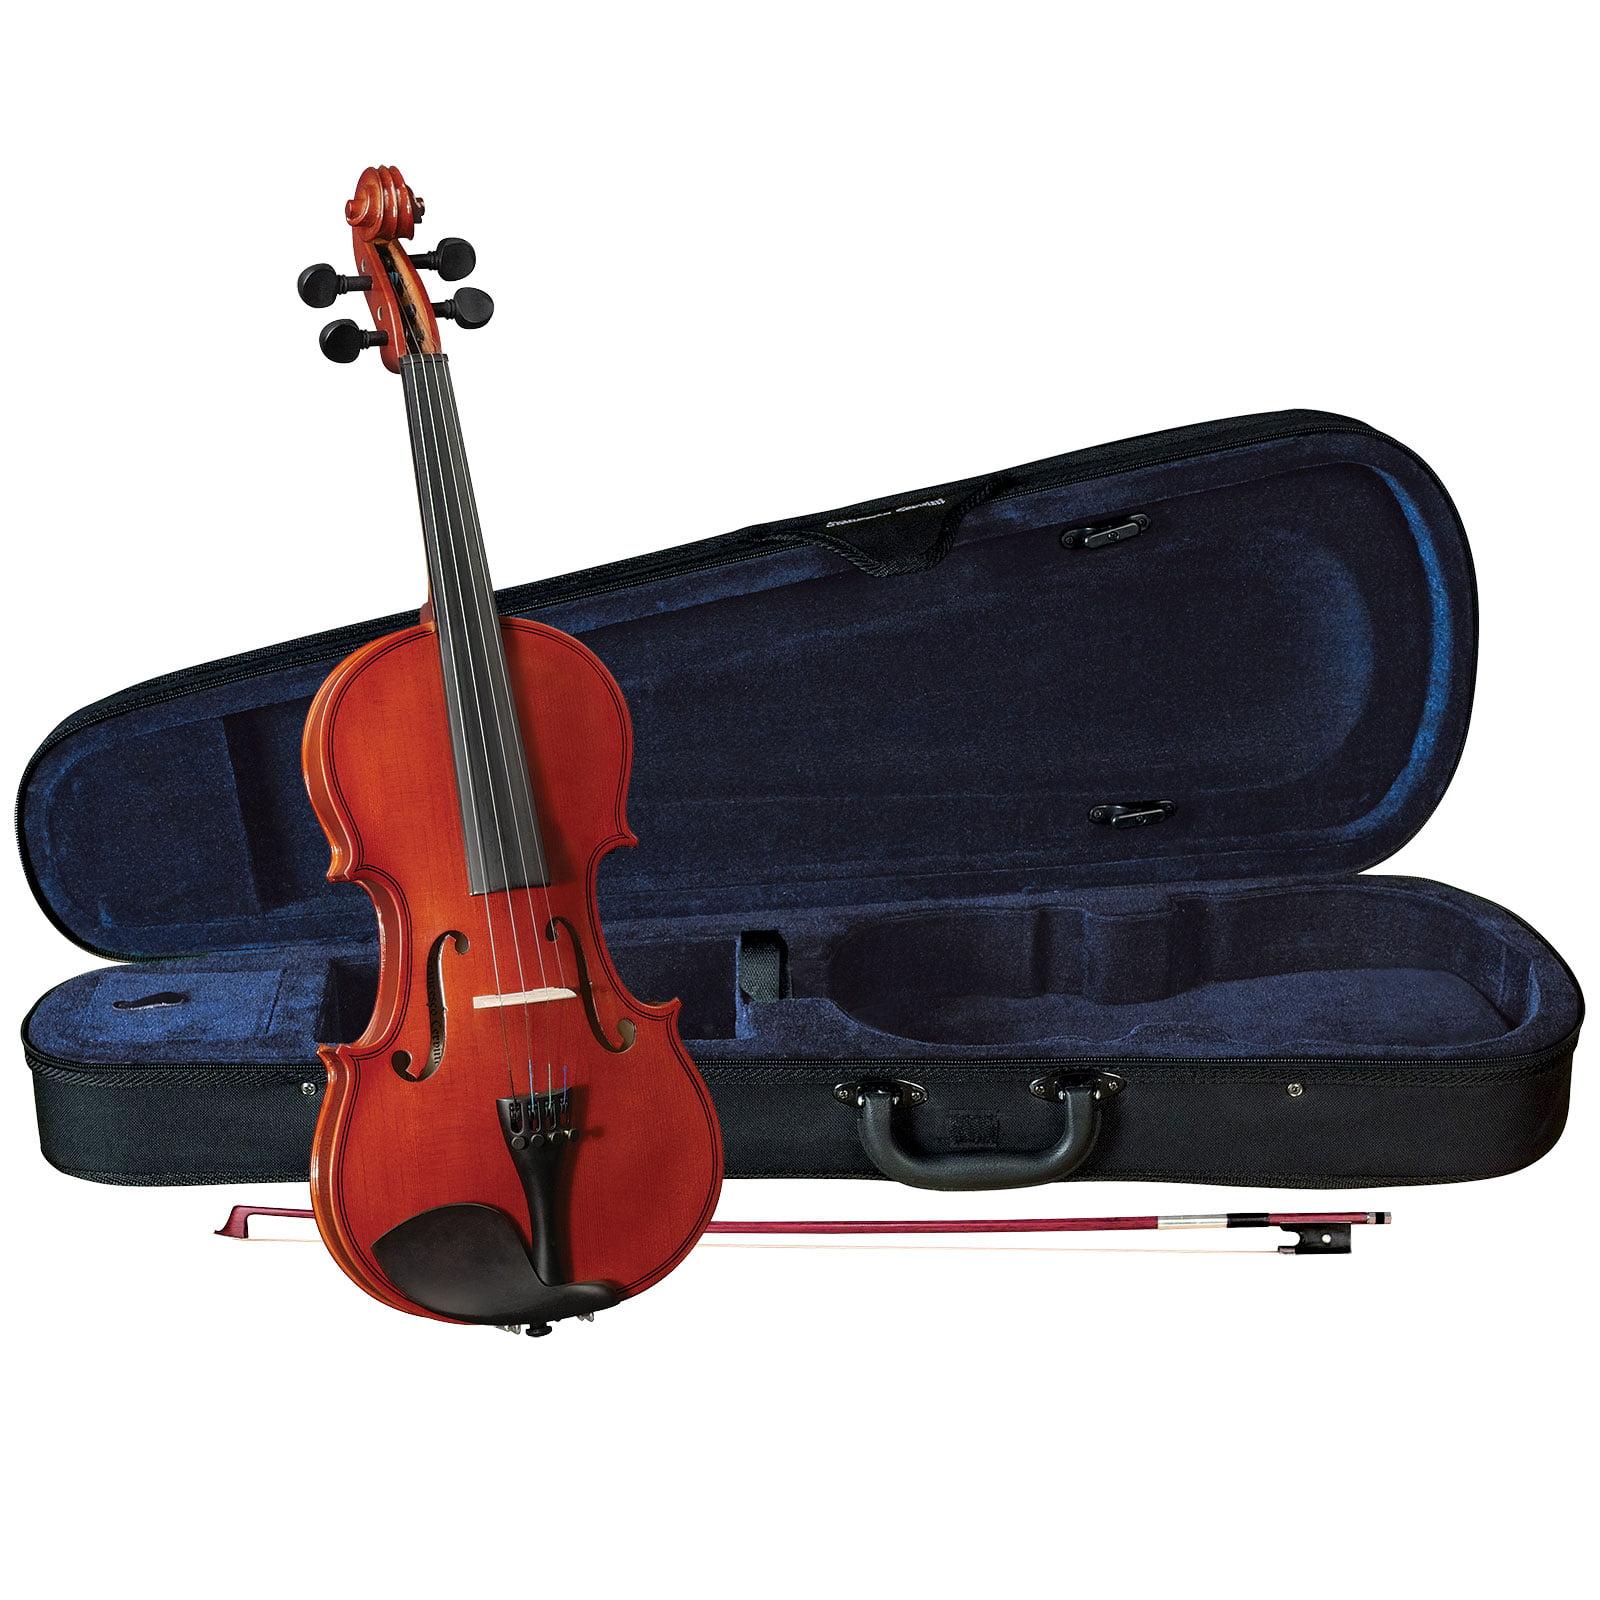 Cervini HV-100 Novice Violin Outfit 4 4 Size by Cervini